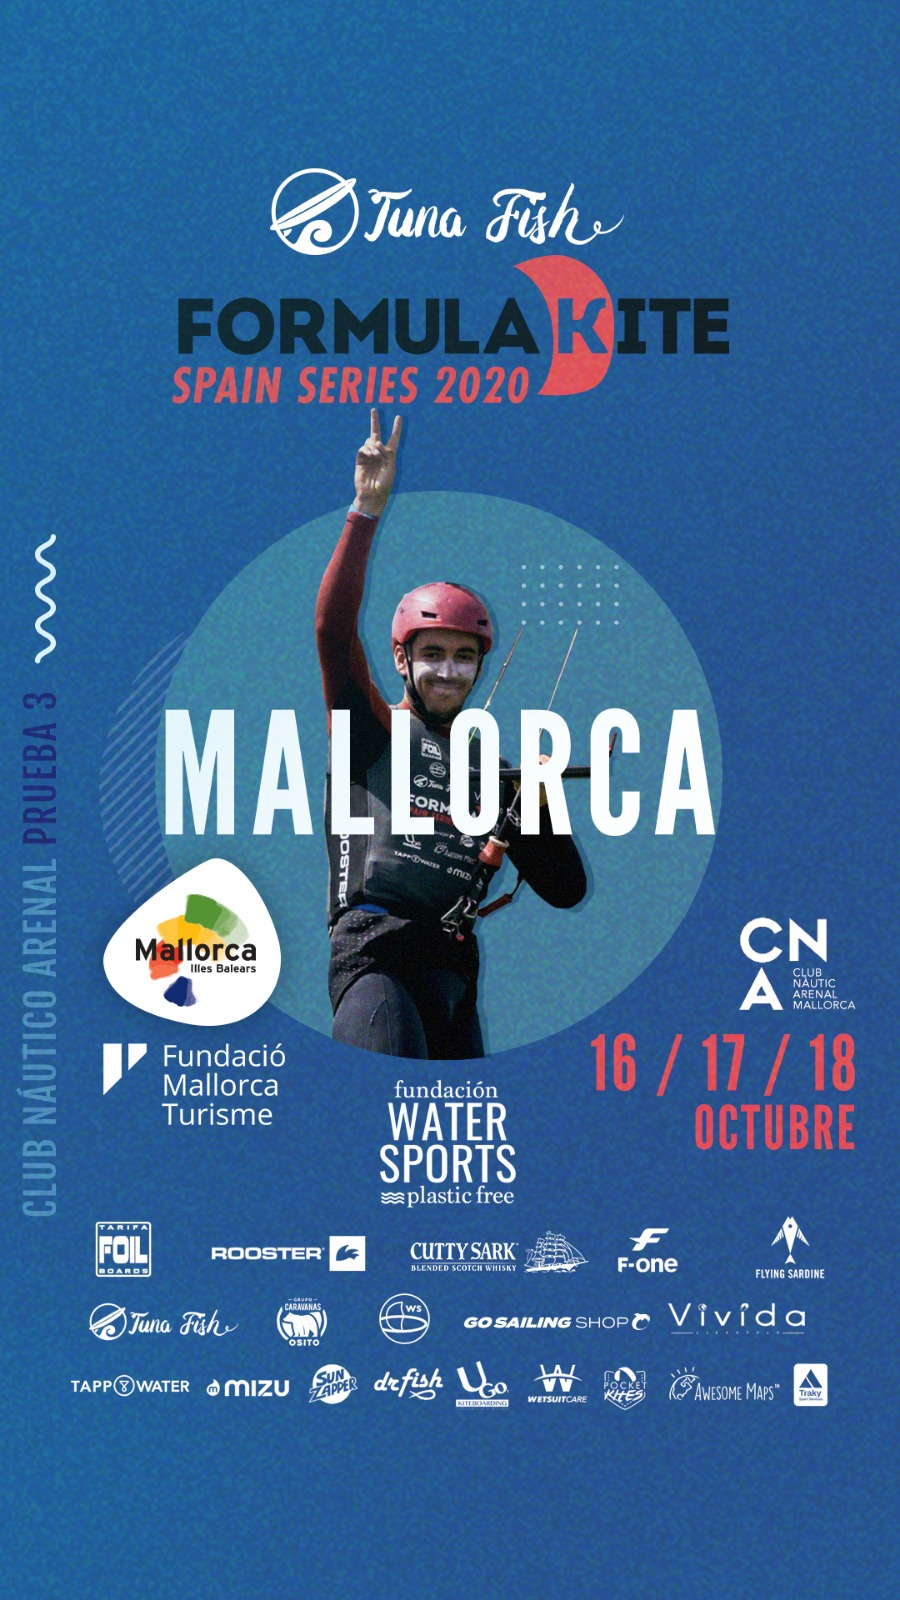 Póster Tuna Fish FKSS 2020 Mallorca